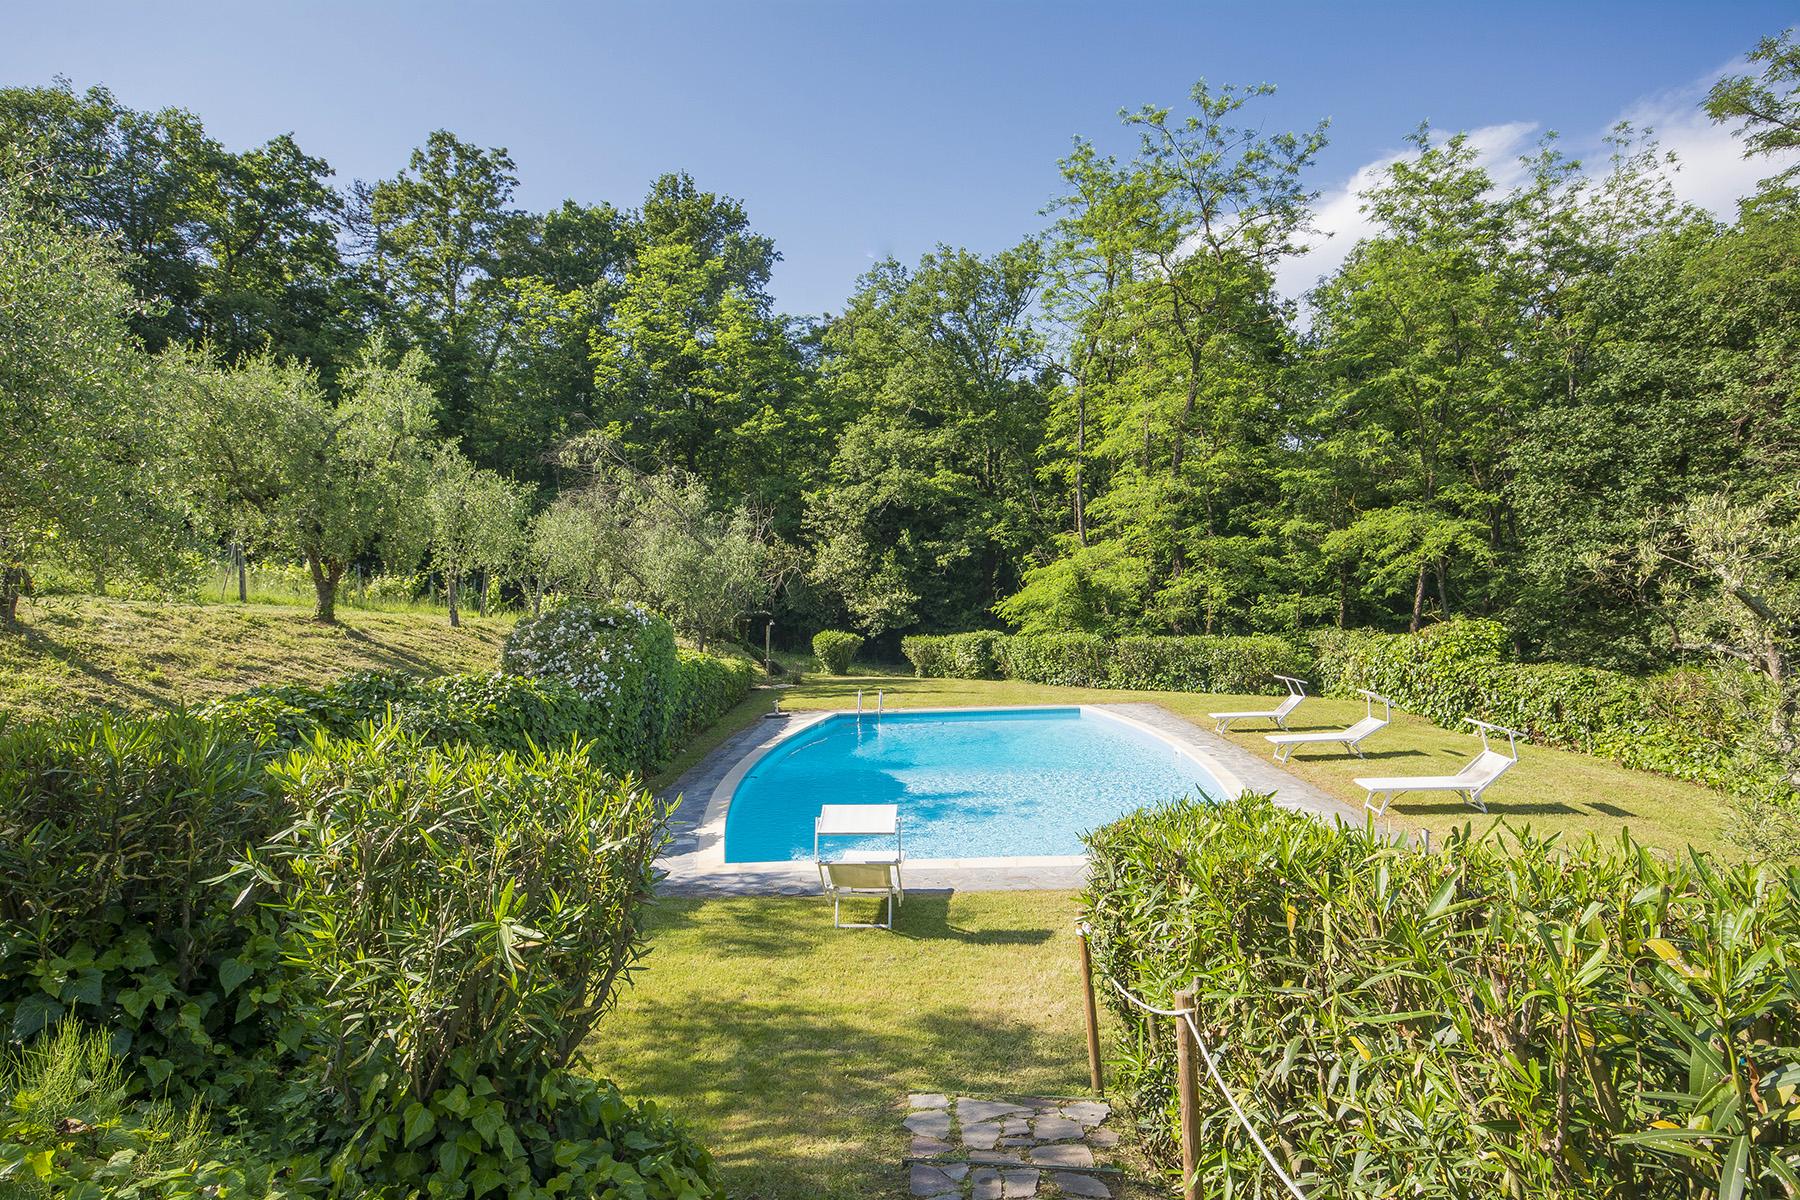 Villa in Vendita a Lucca: 5 locali, 600 mq - Foto 5